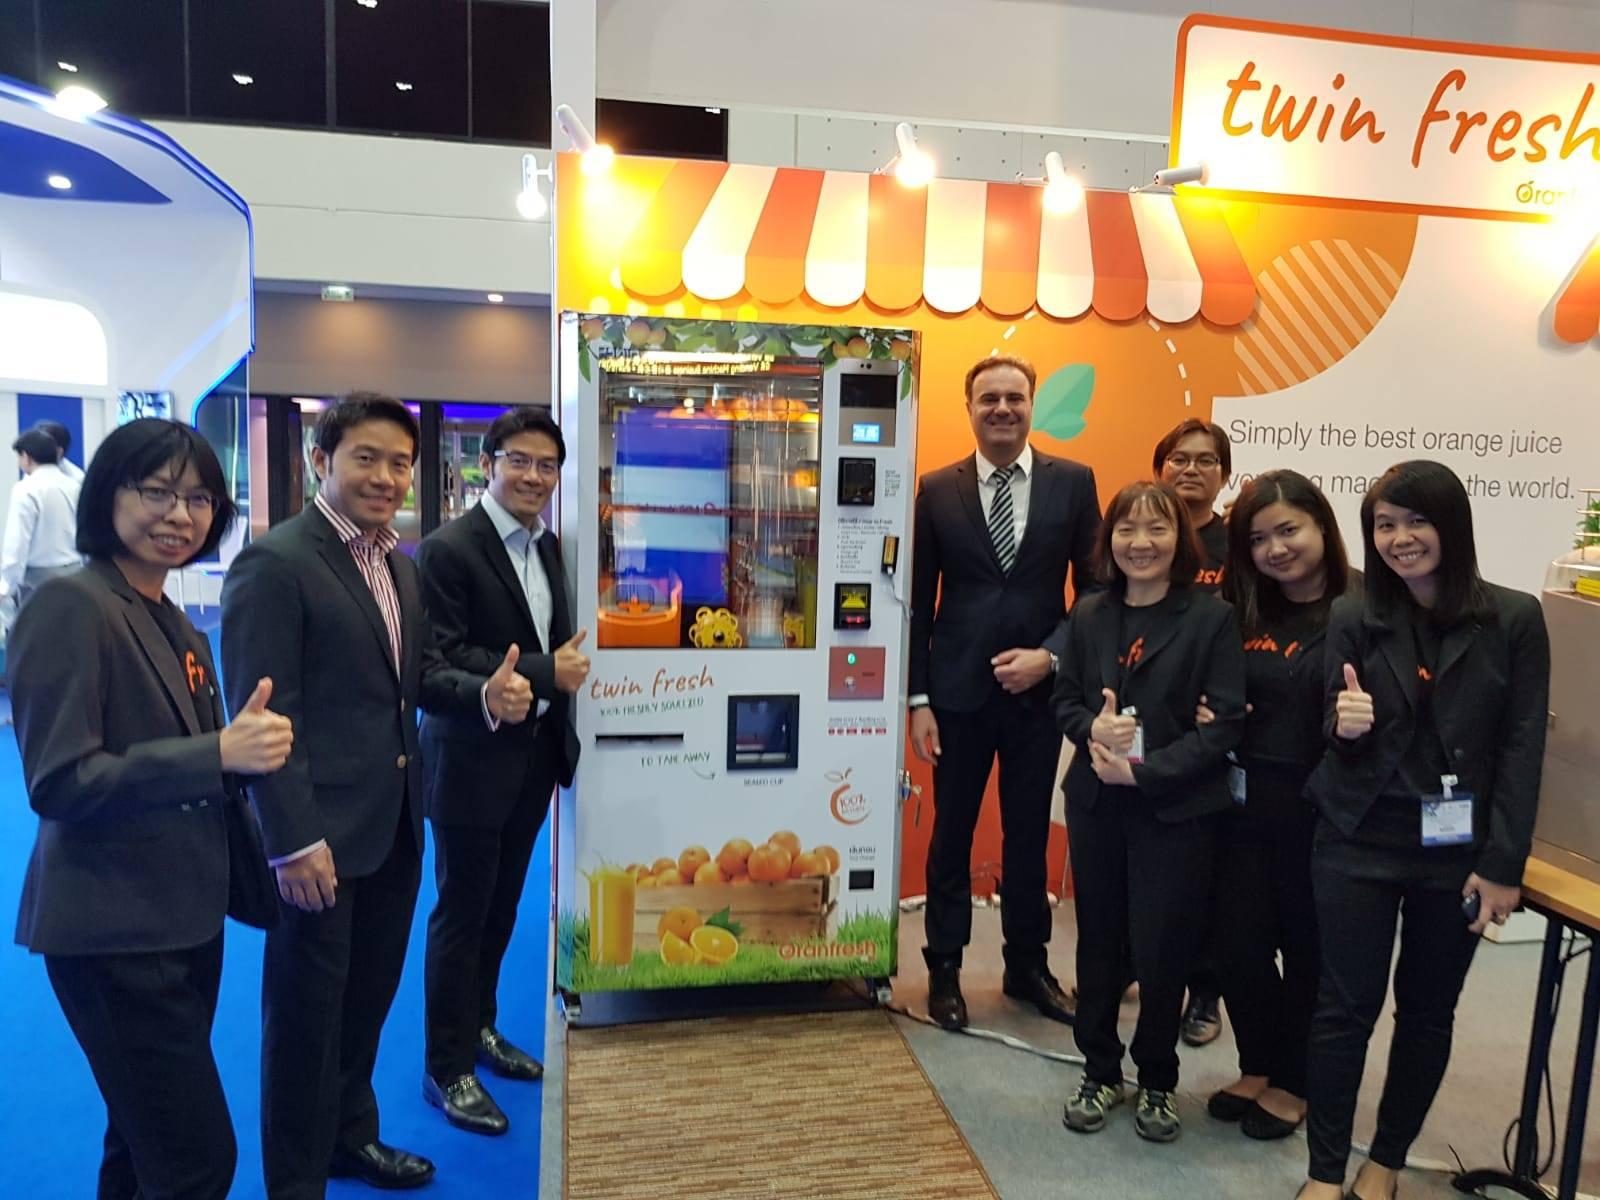 Oranfresh at VendASEAN 2019 in Bangkok